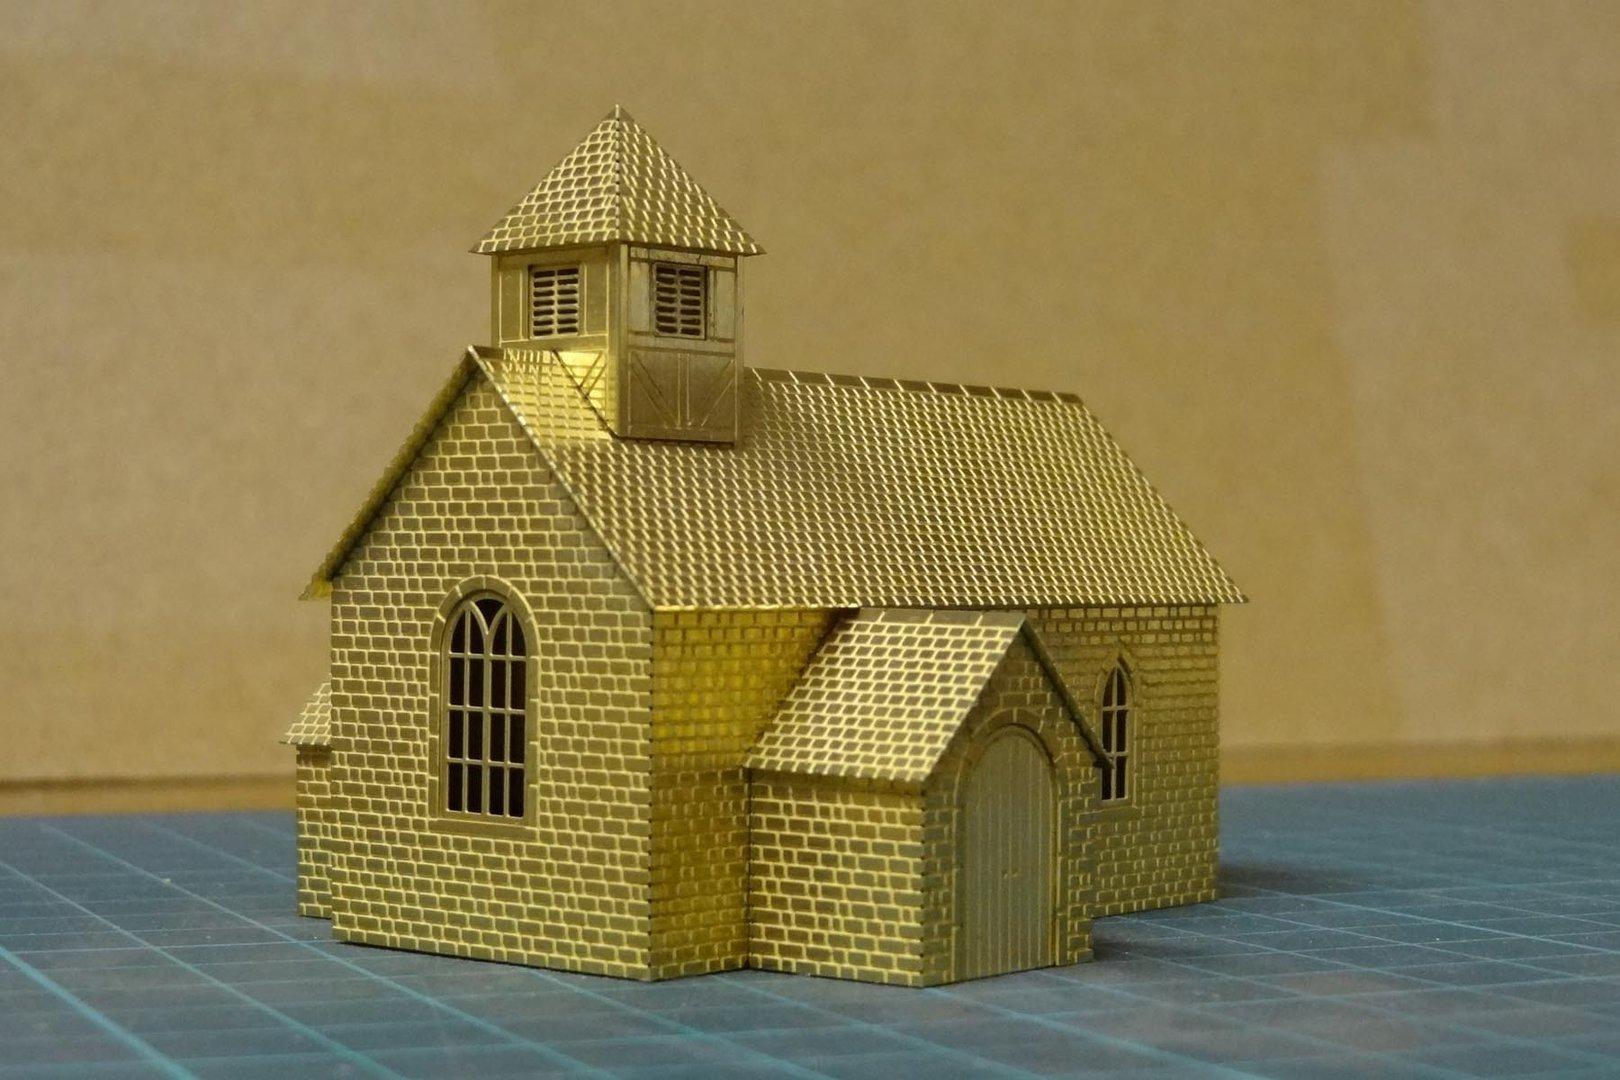 N scale model houses